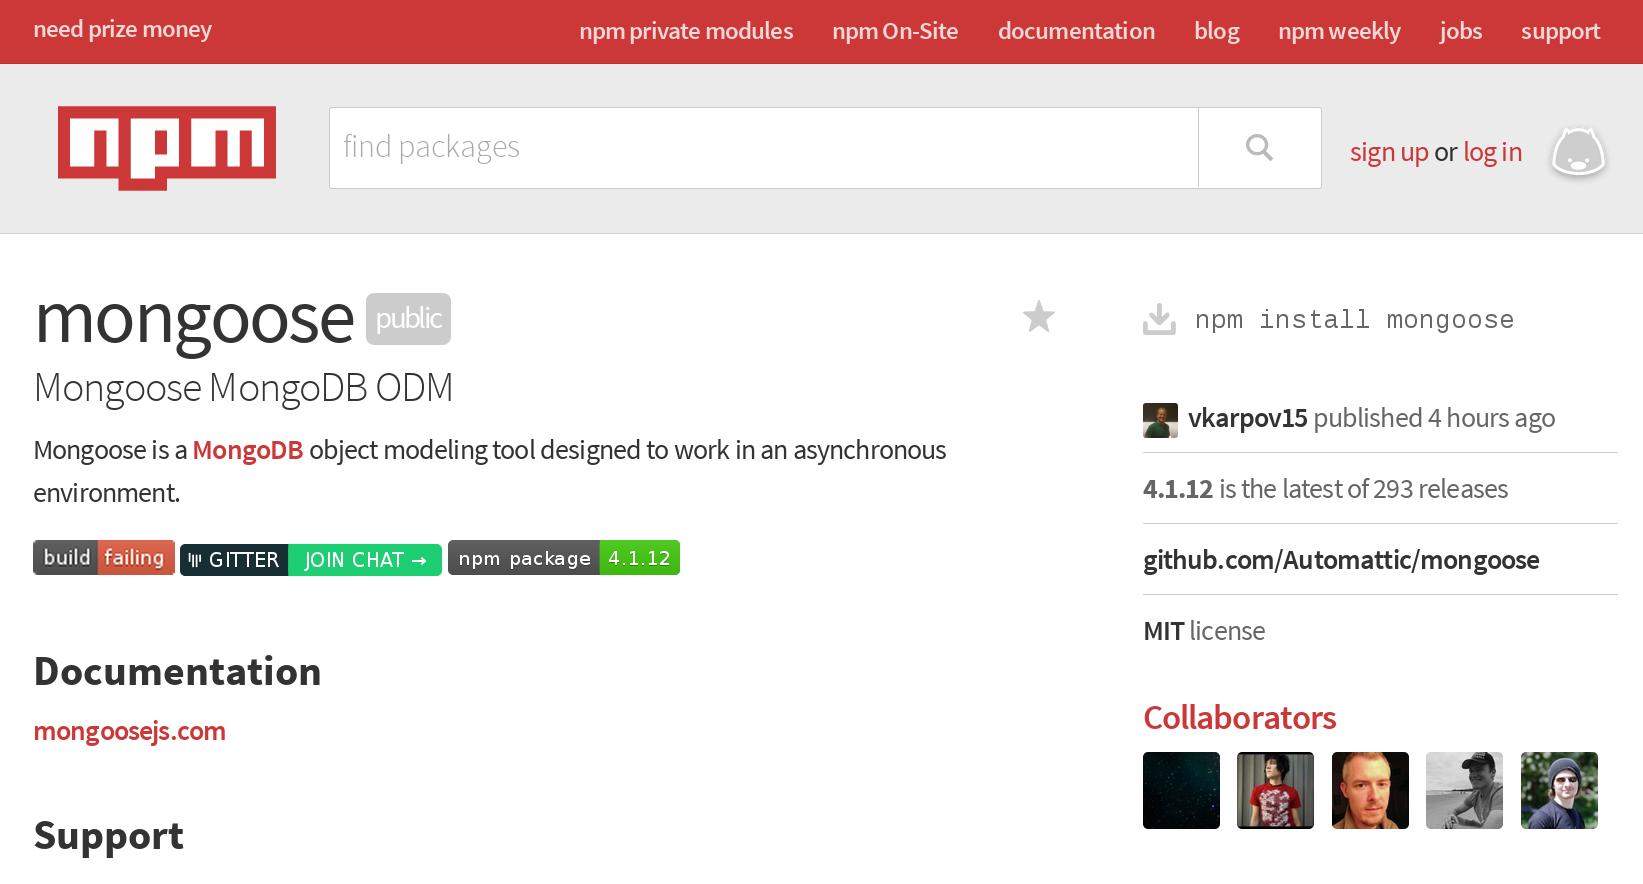 npmjs.com Mongoose package detail